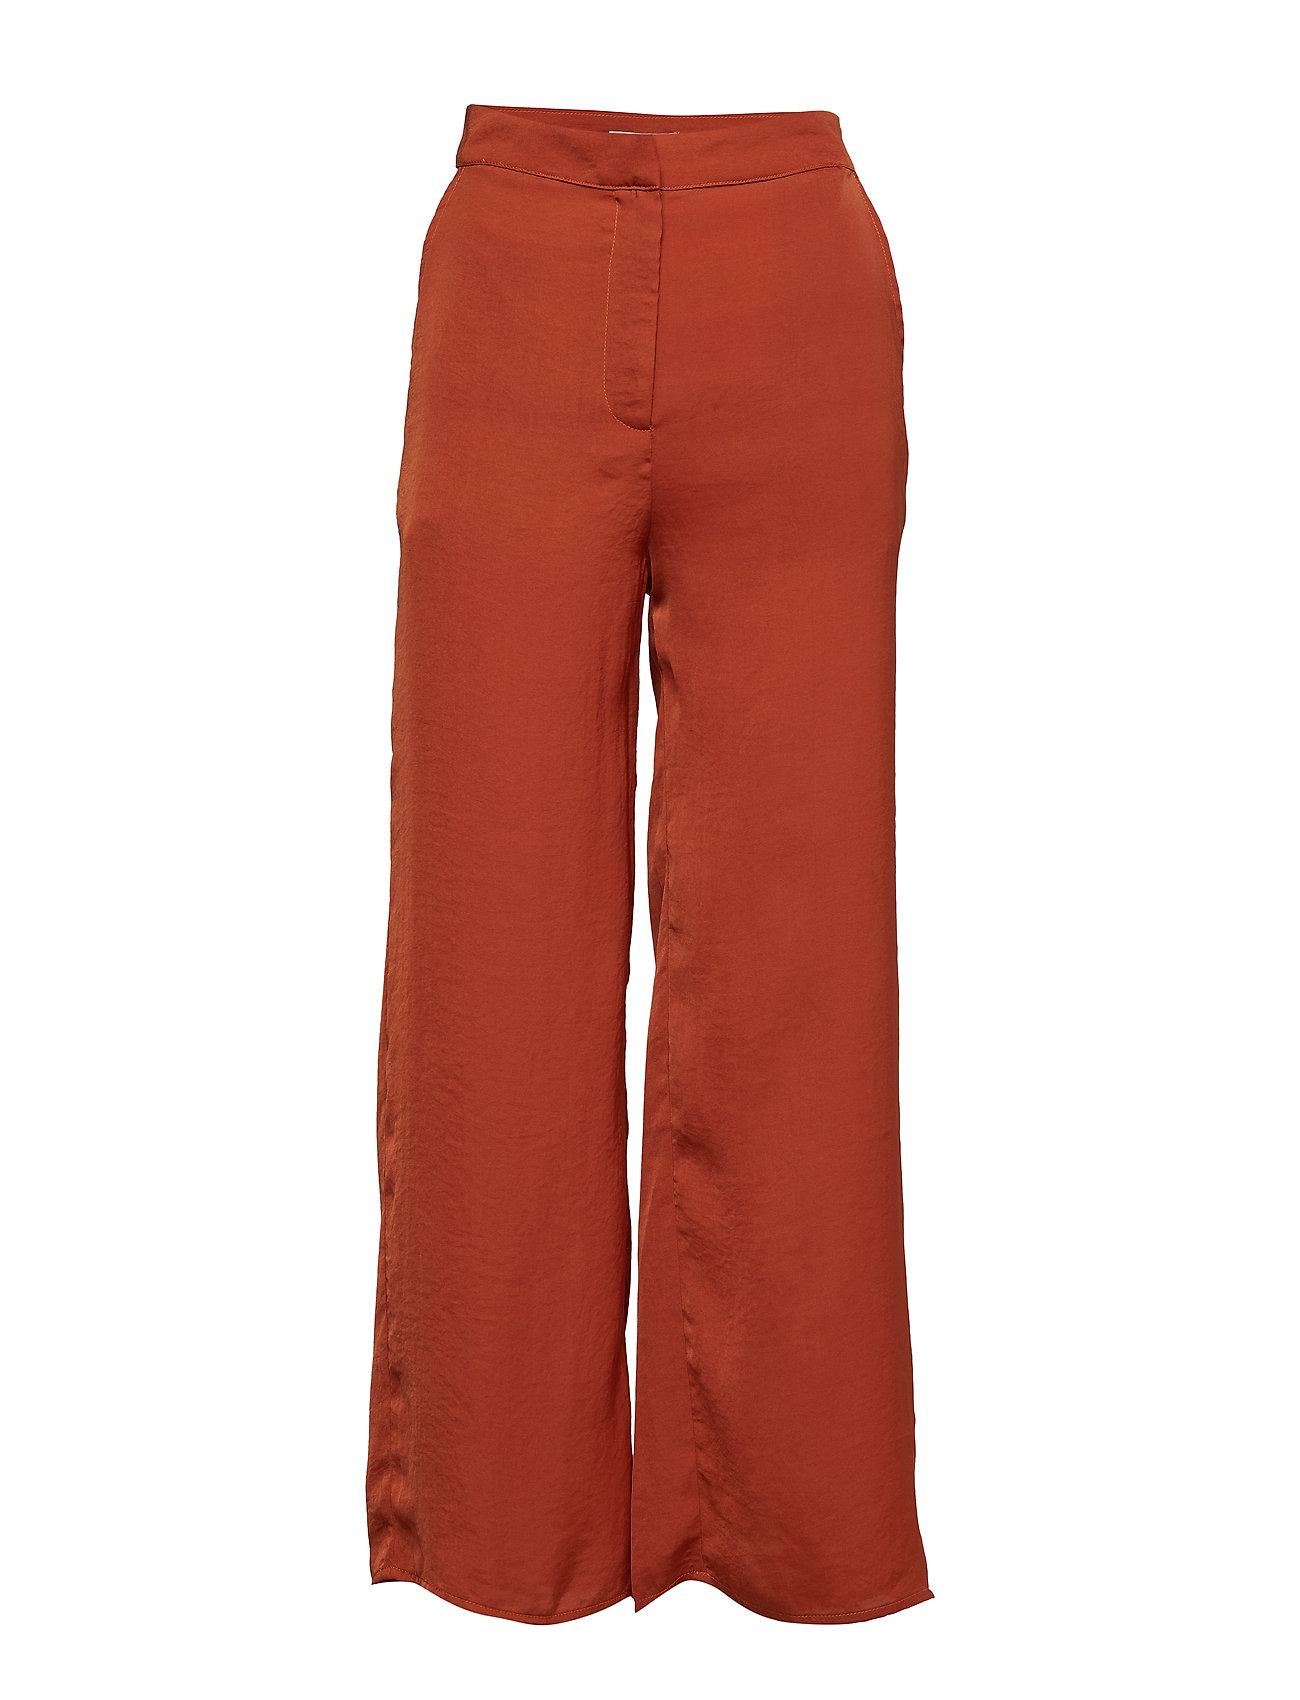 Aéryne Adeleine trousers - COGNAC